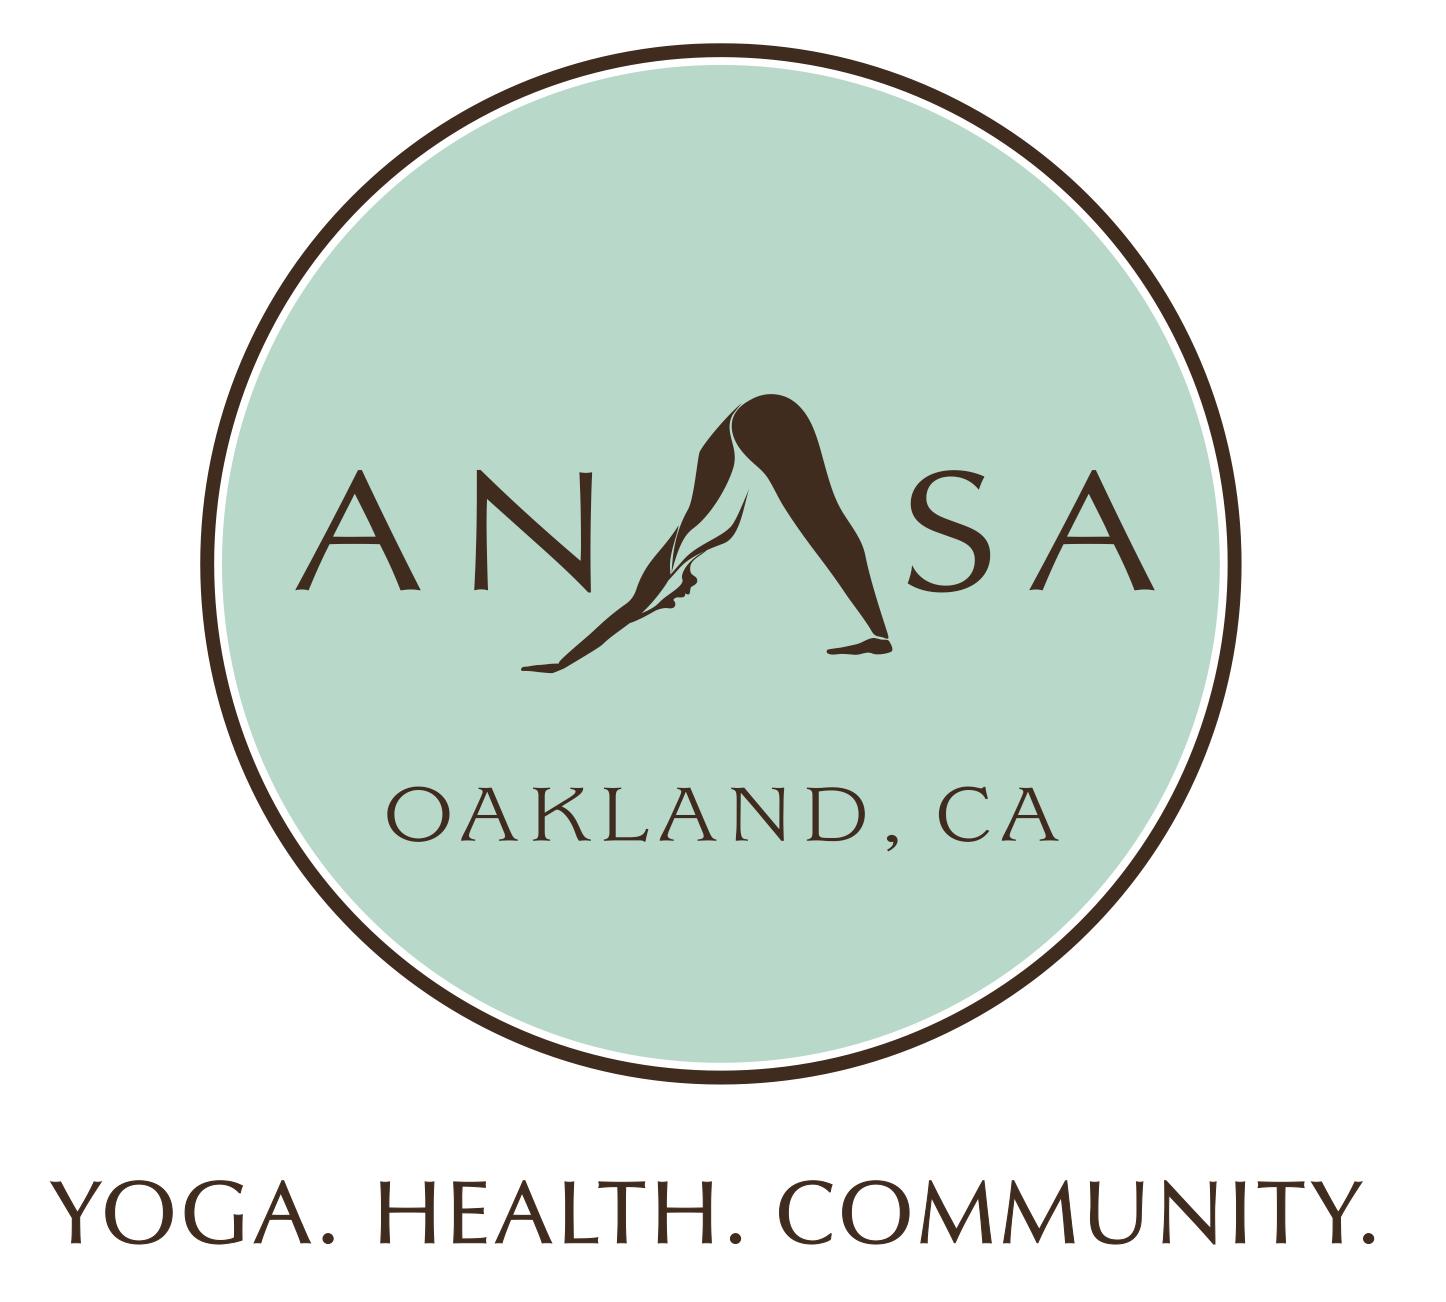 - Visit Anasa Yoga4232 MacArthur BLVDOakland, Ca 94619